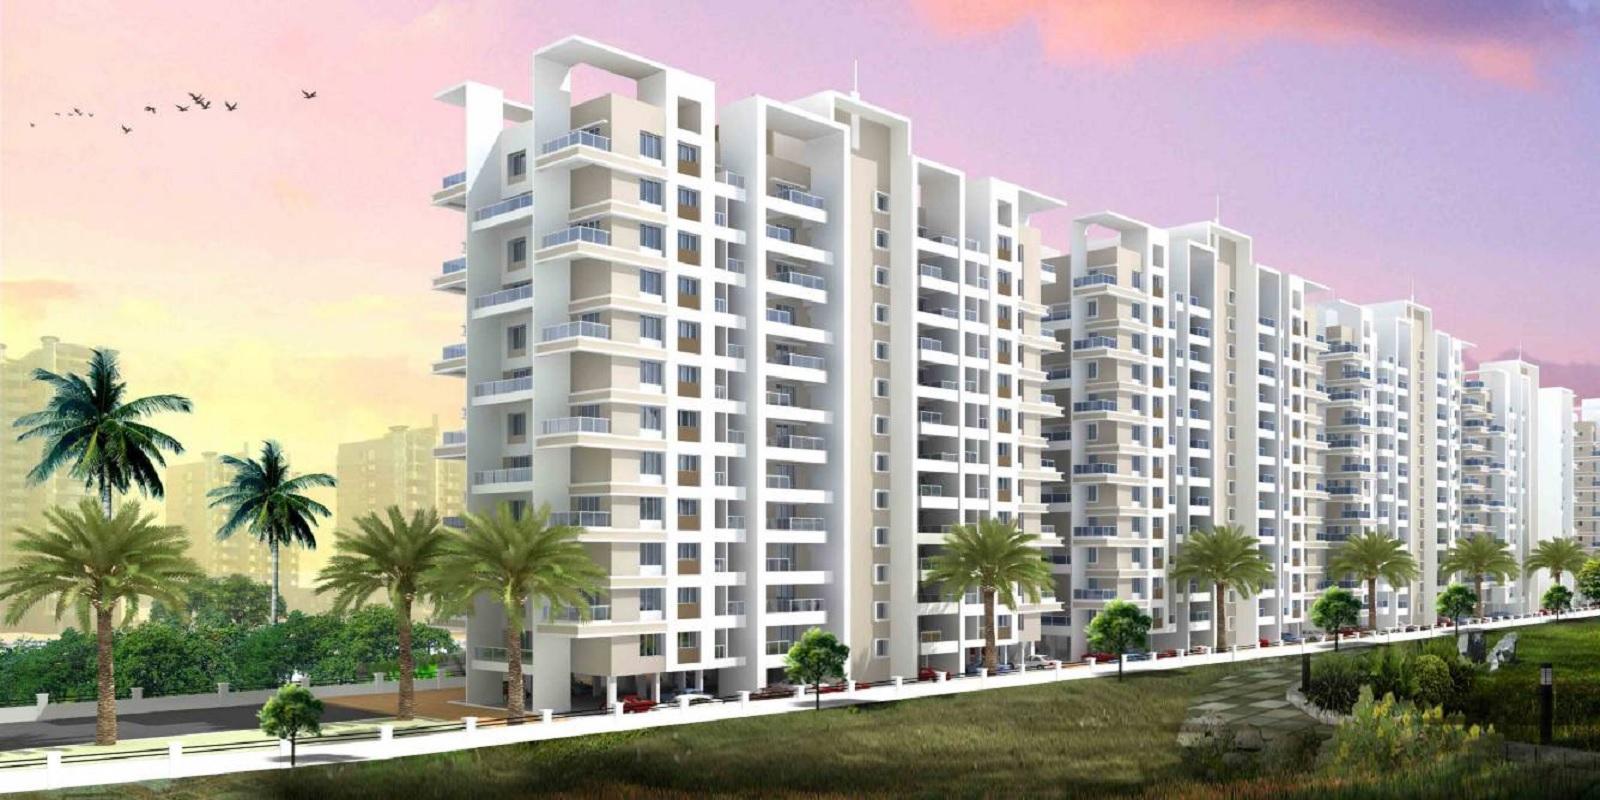 rajheramba one hallmark avenue project project large image1